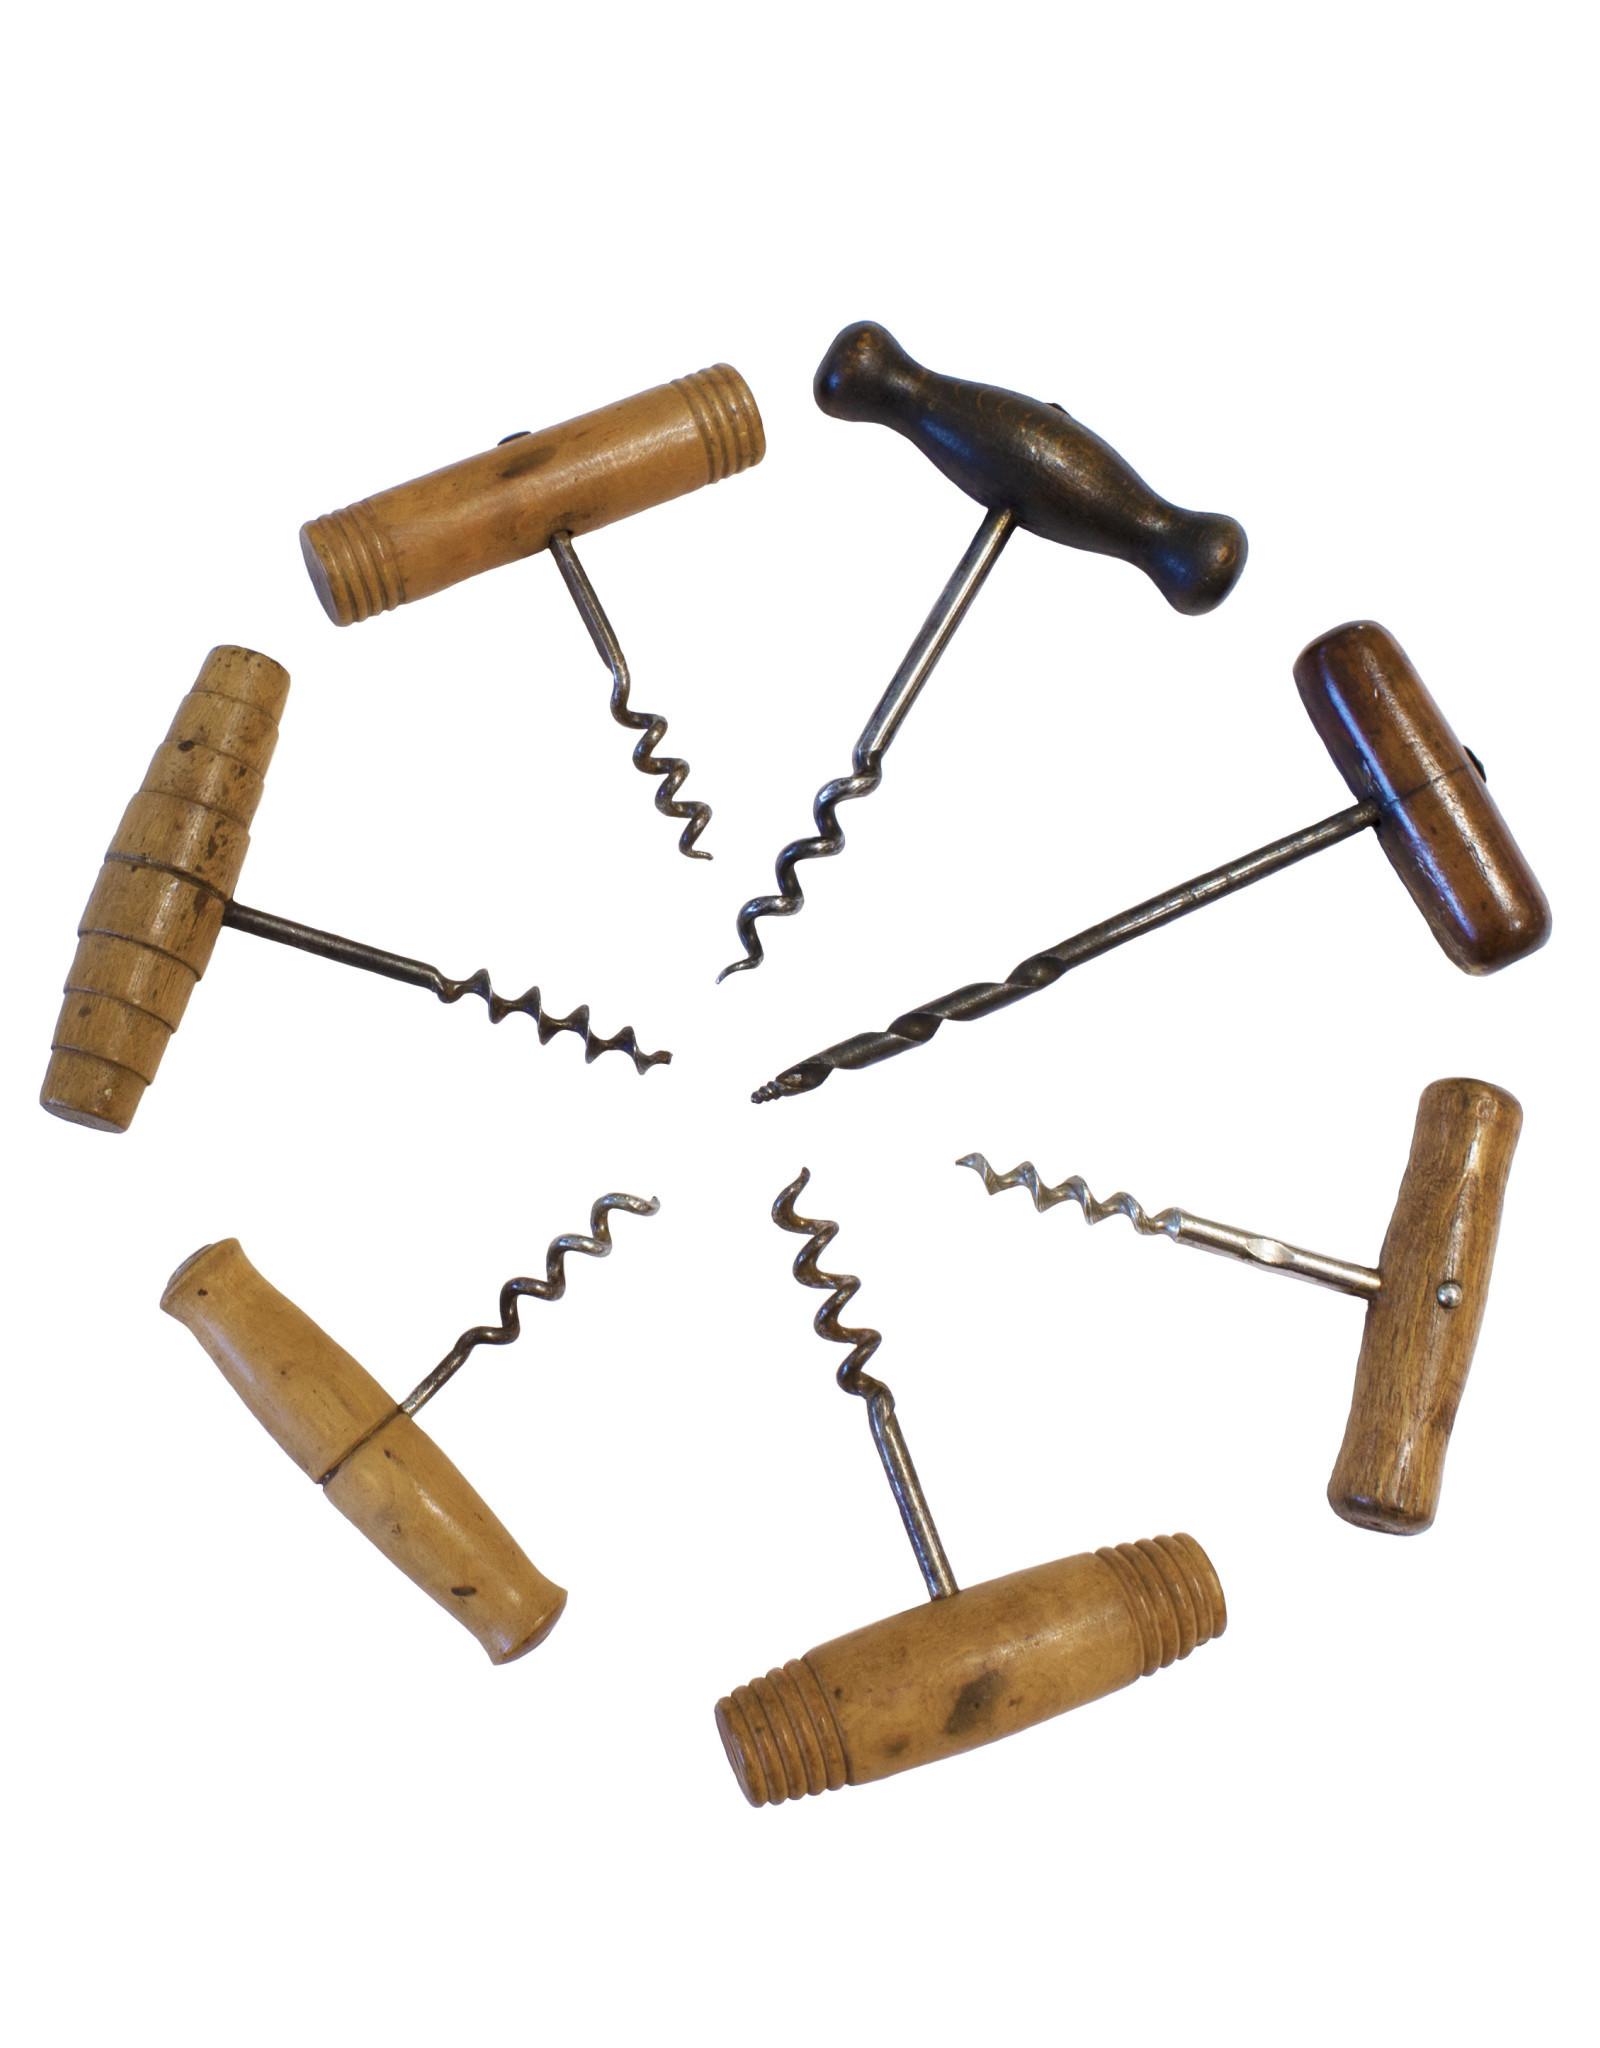 antique-wooden-corkscrew-1900.jpg